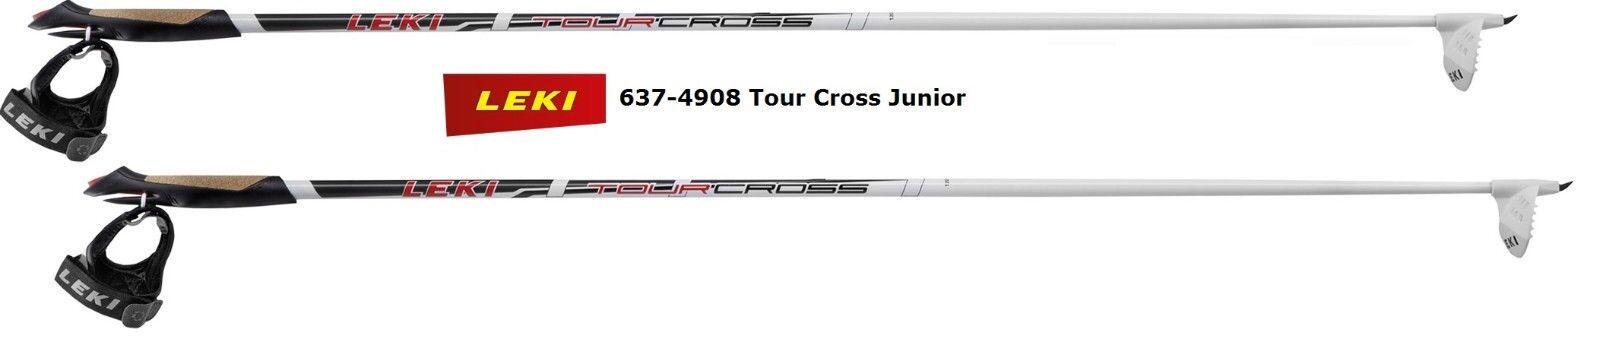 LEKI LEKI LEKI Tour Cross Junior Langlaufstöcke 6374908 - Trigger Shark - Racing Basket 06c79c